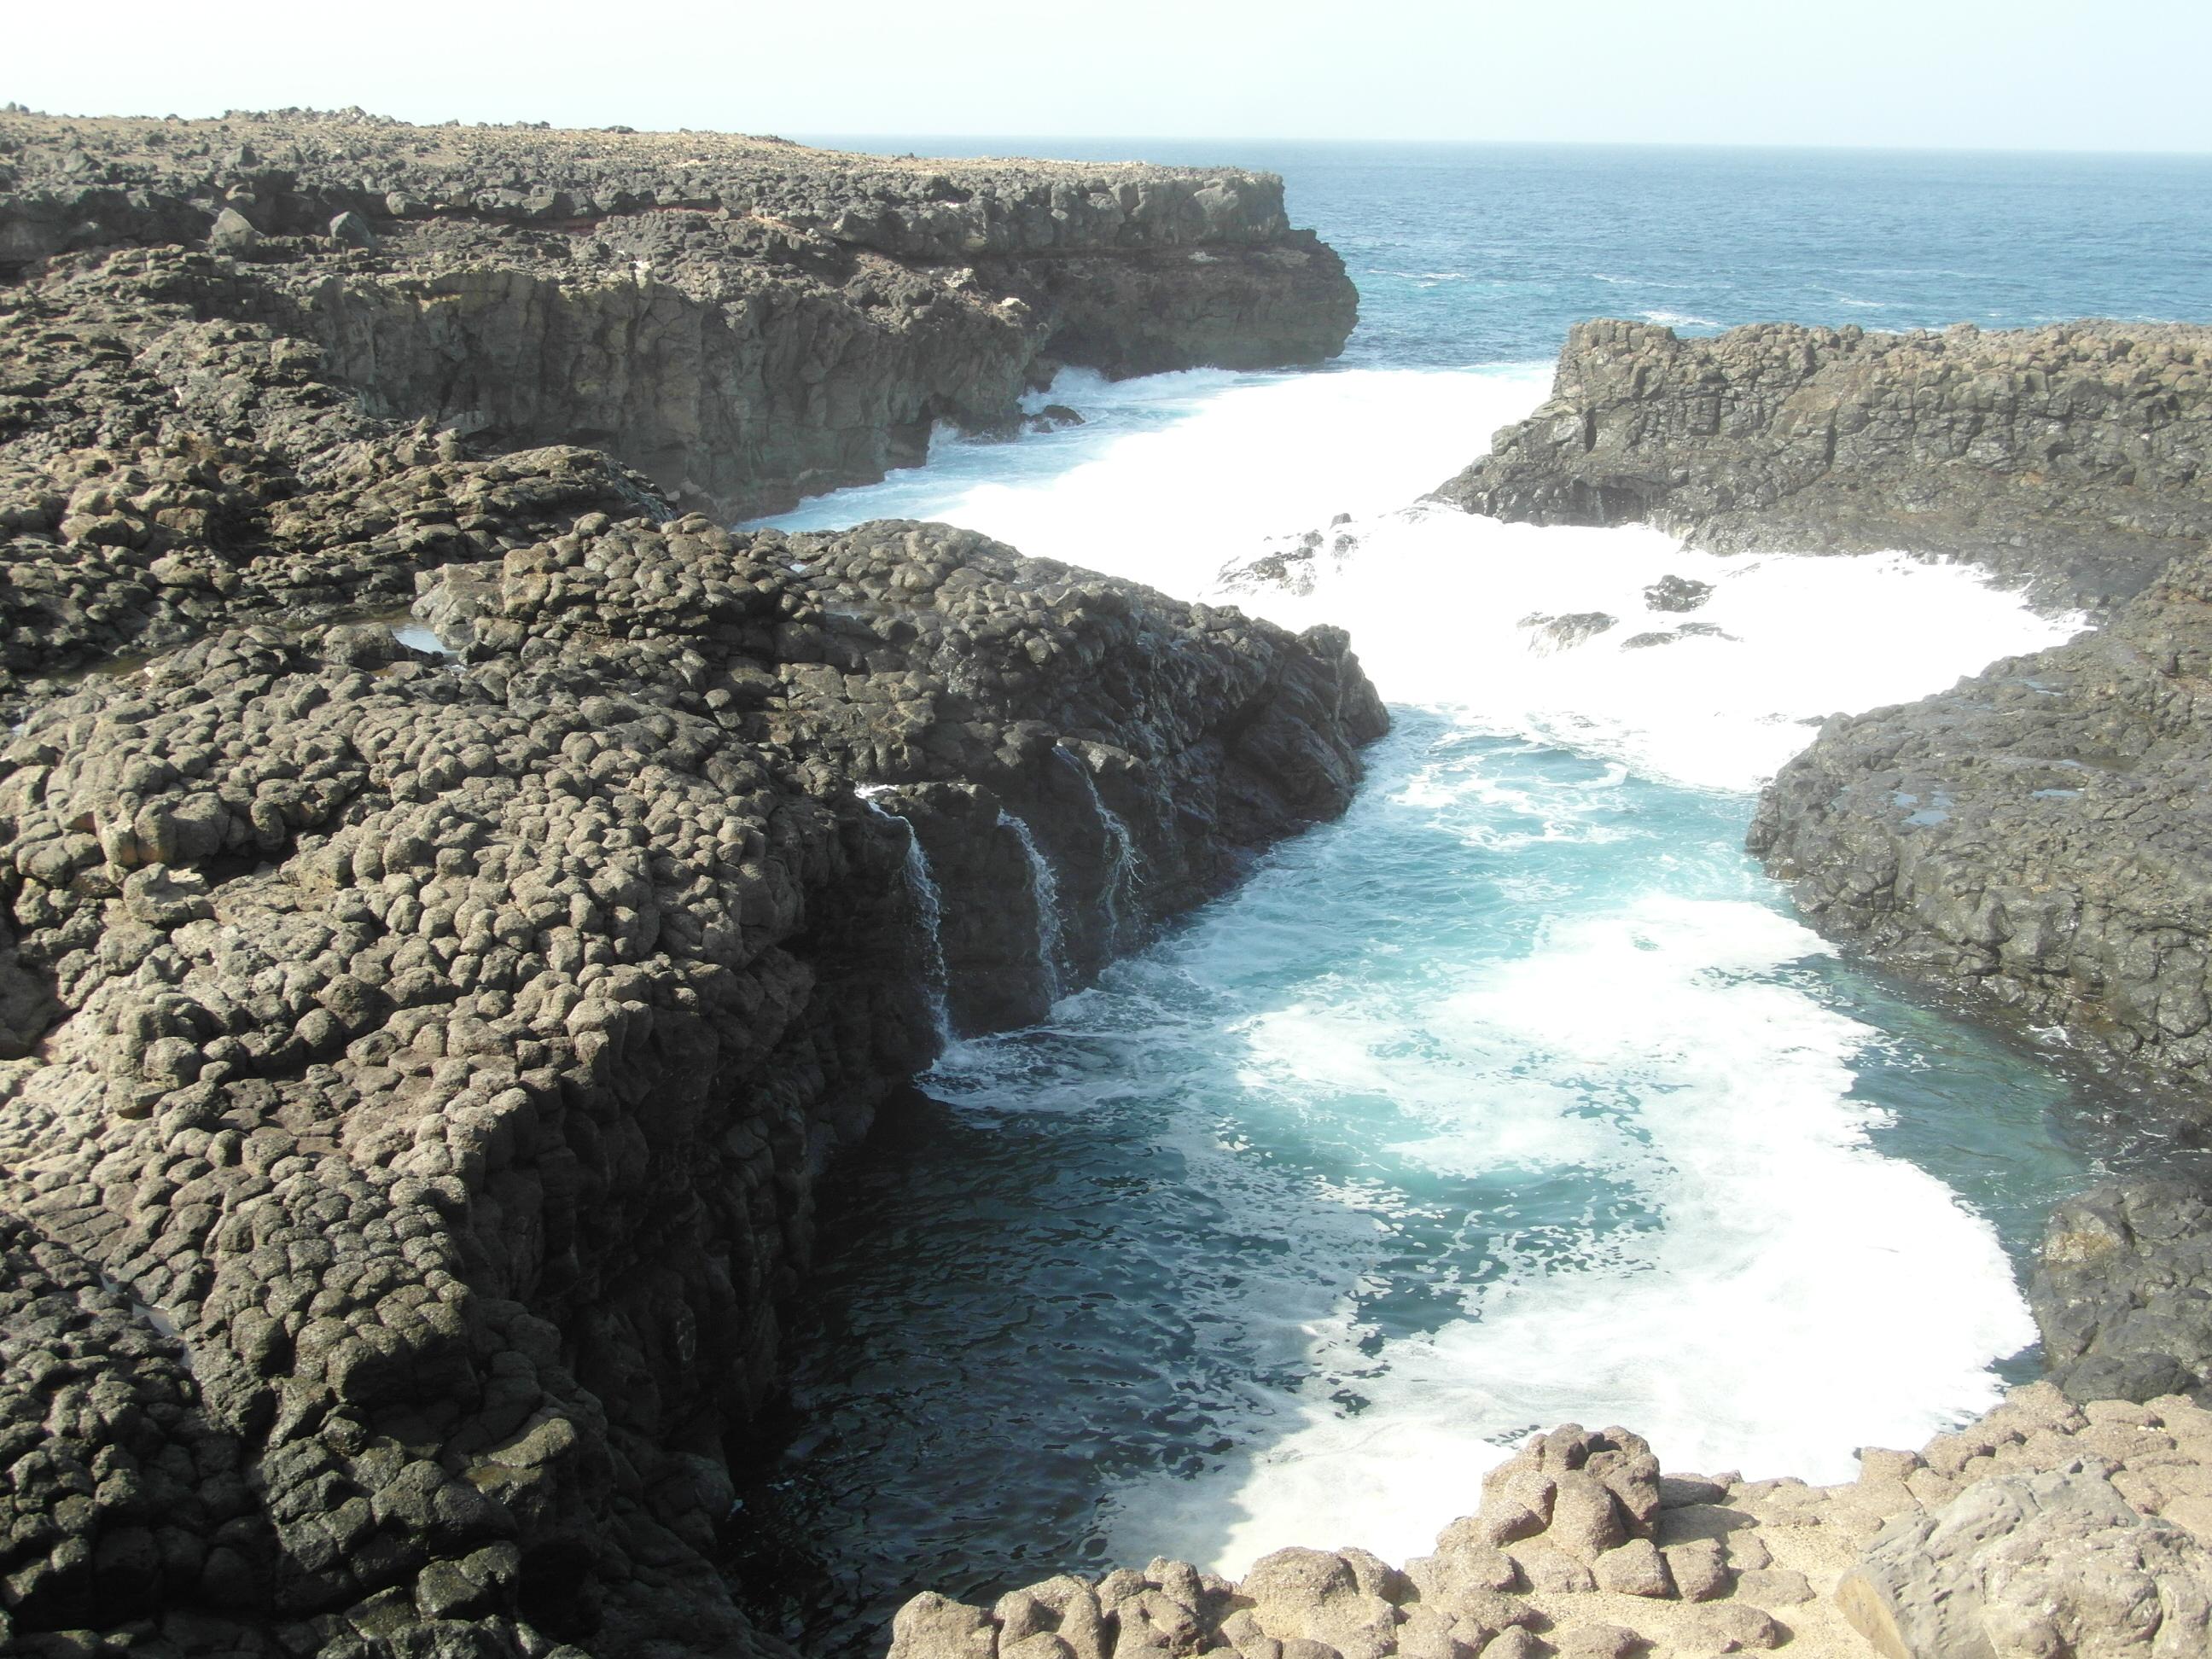 volcanic rocks and rugged coastline